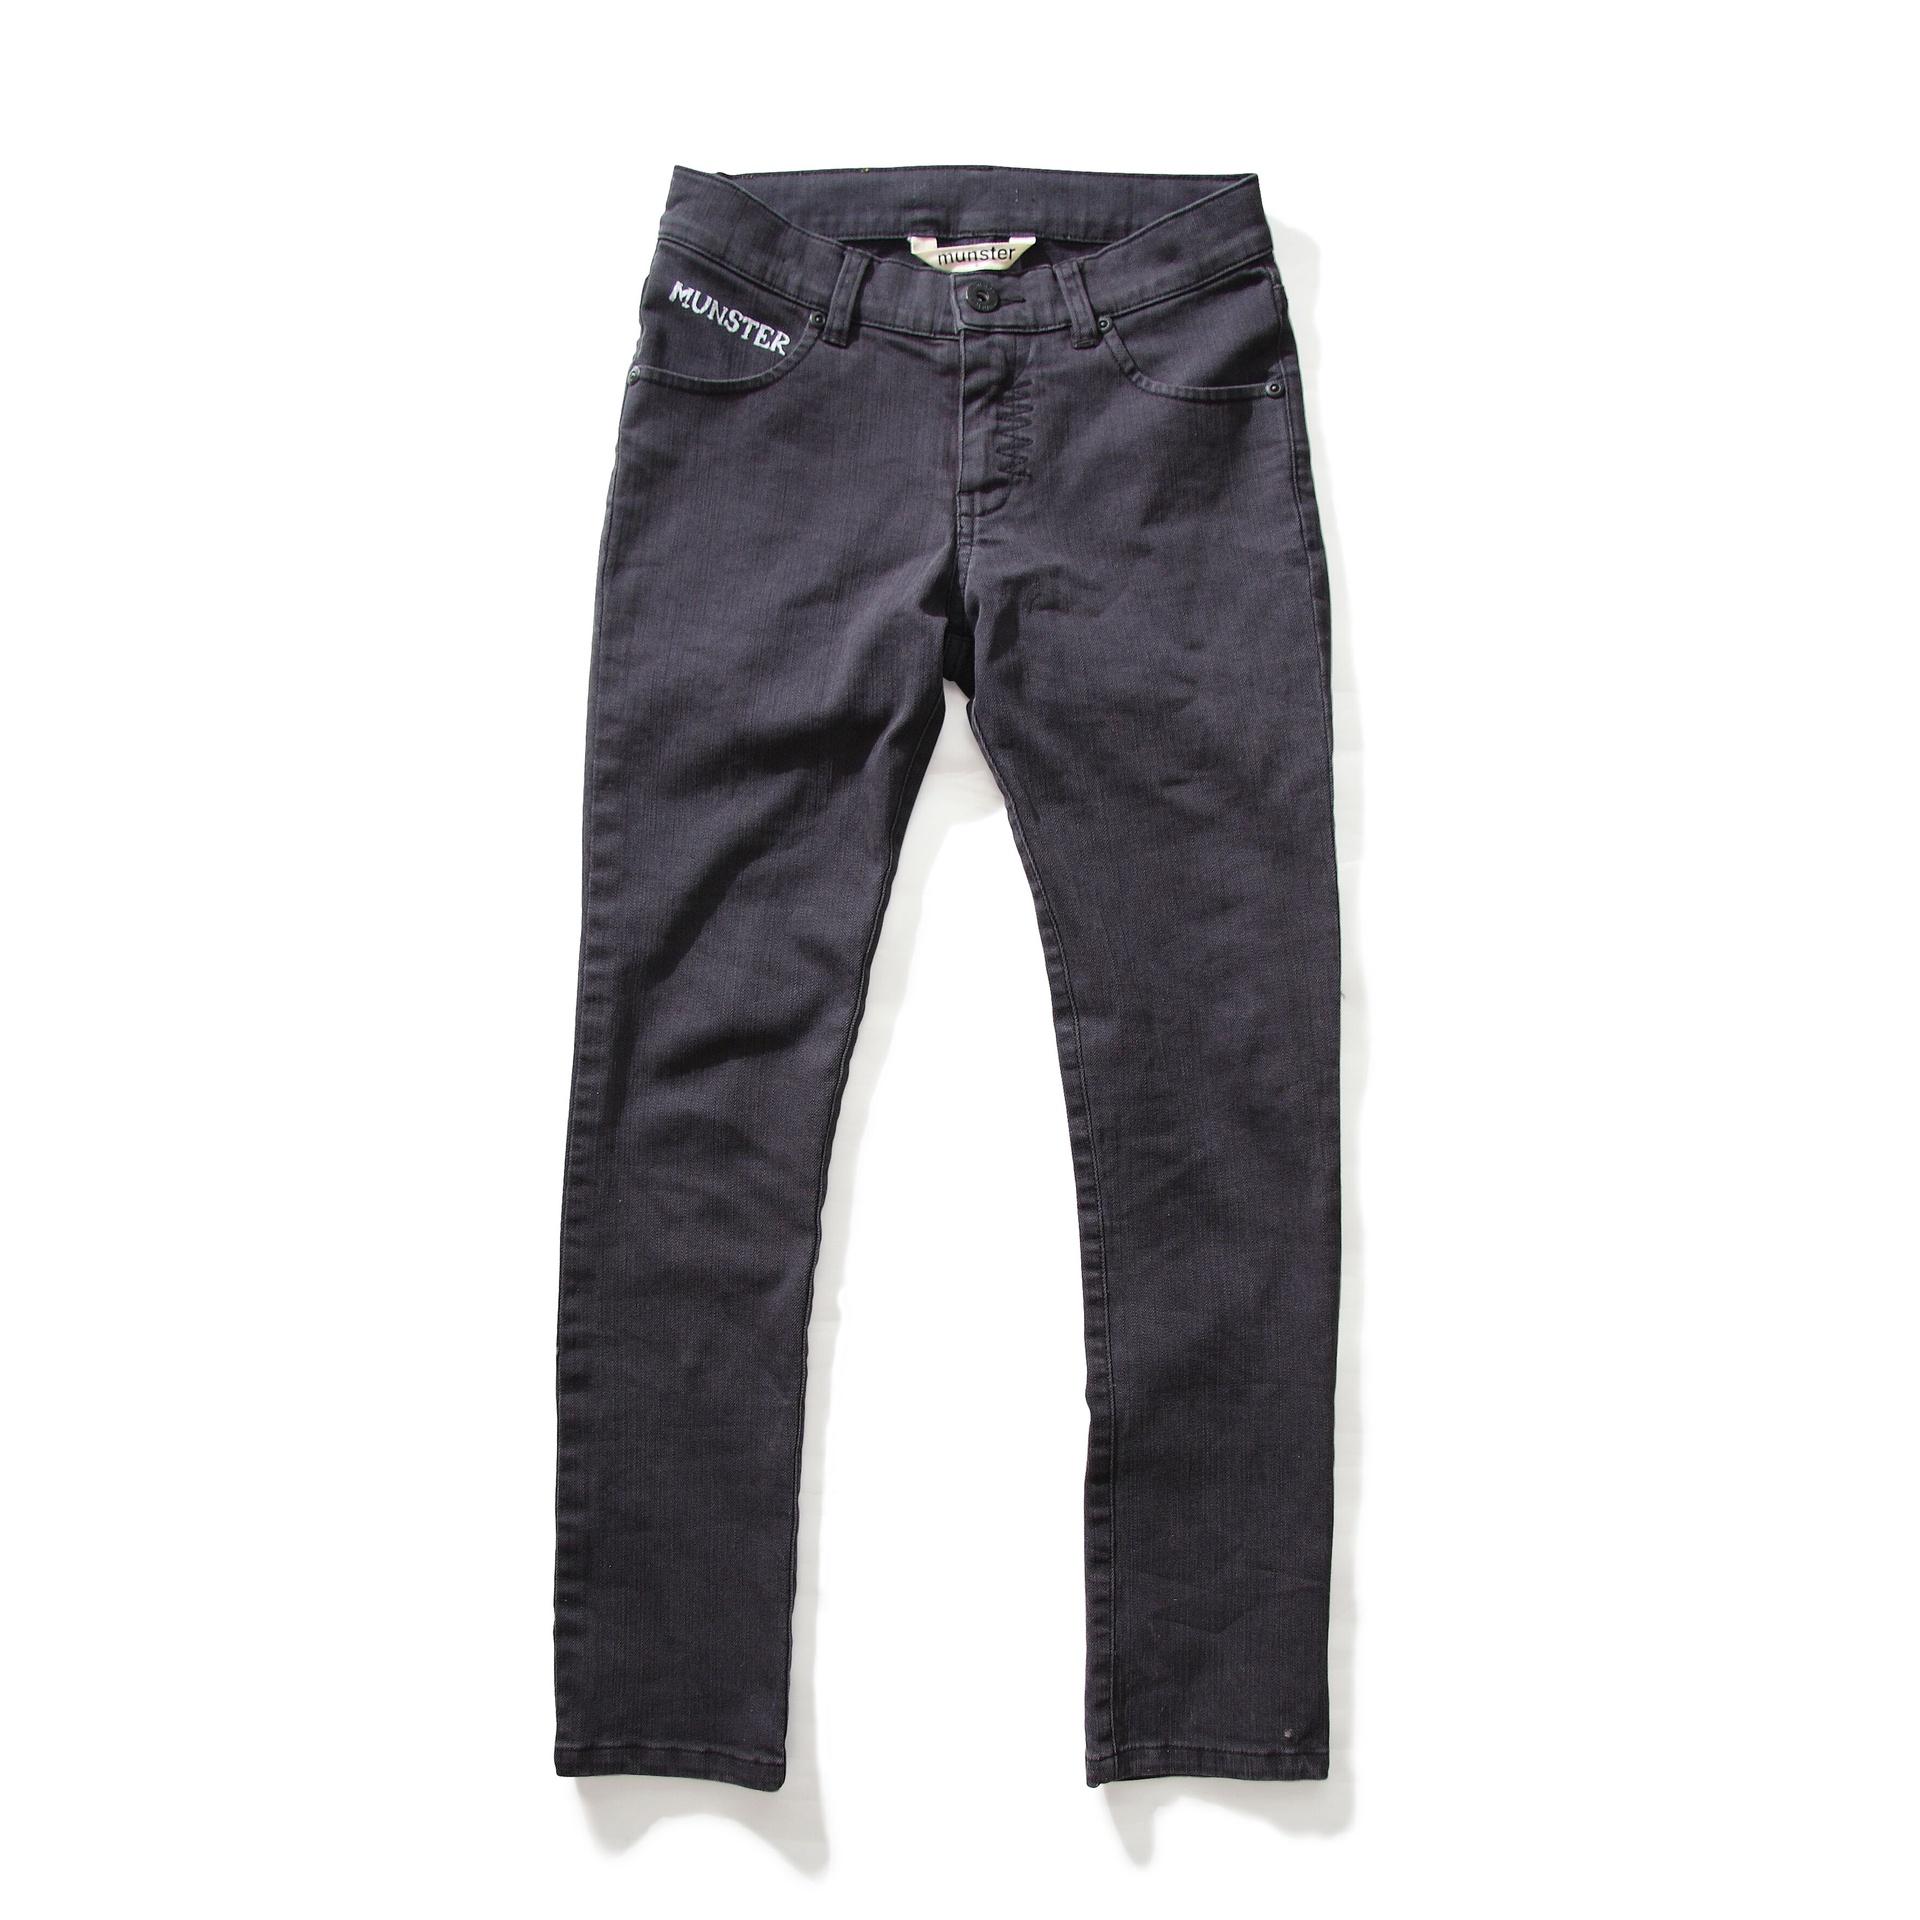 Munster RAMONES Denim Jeans